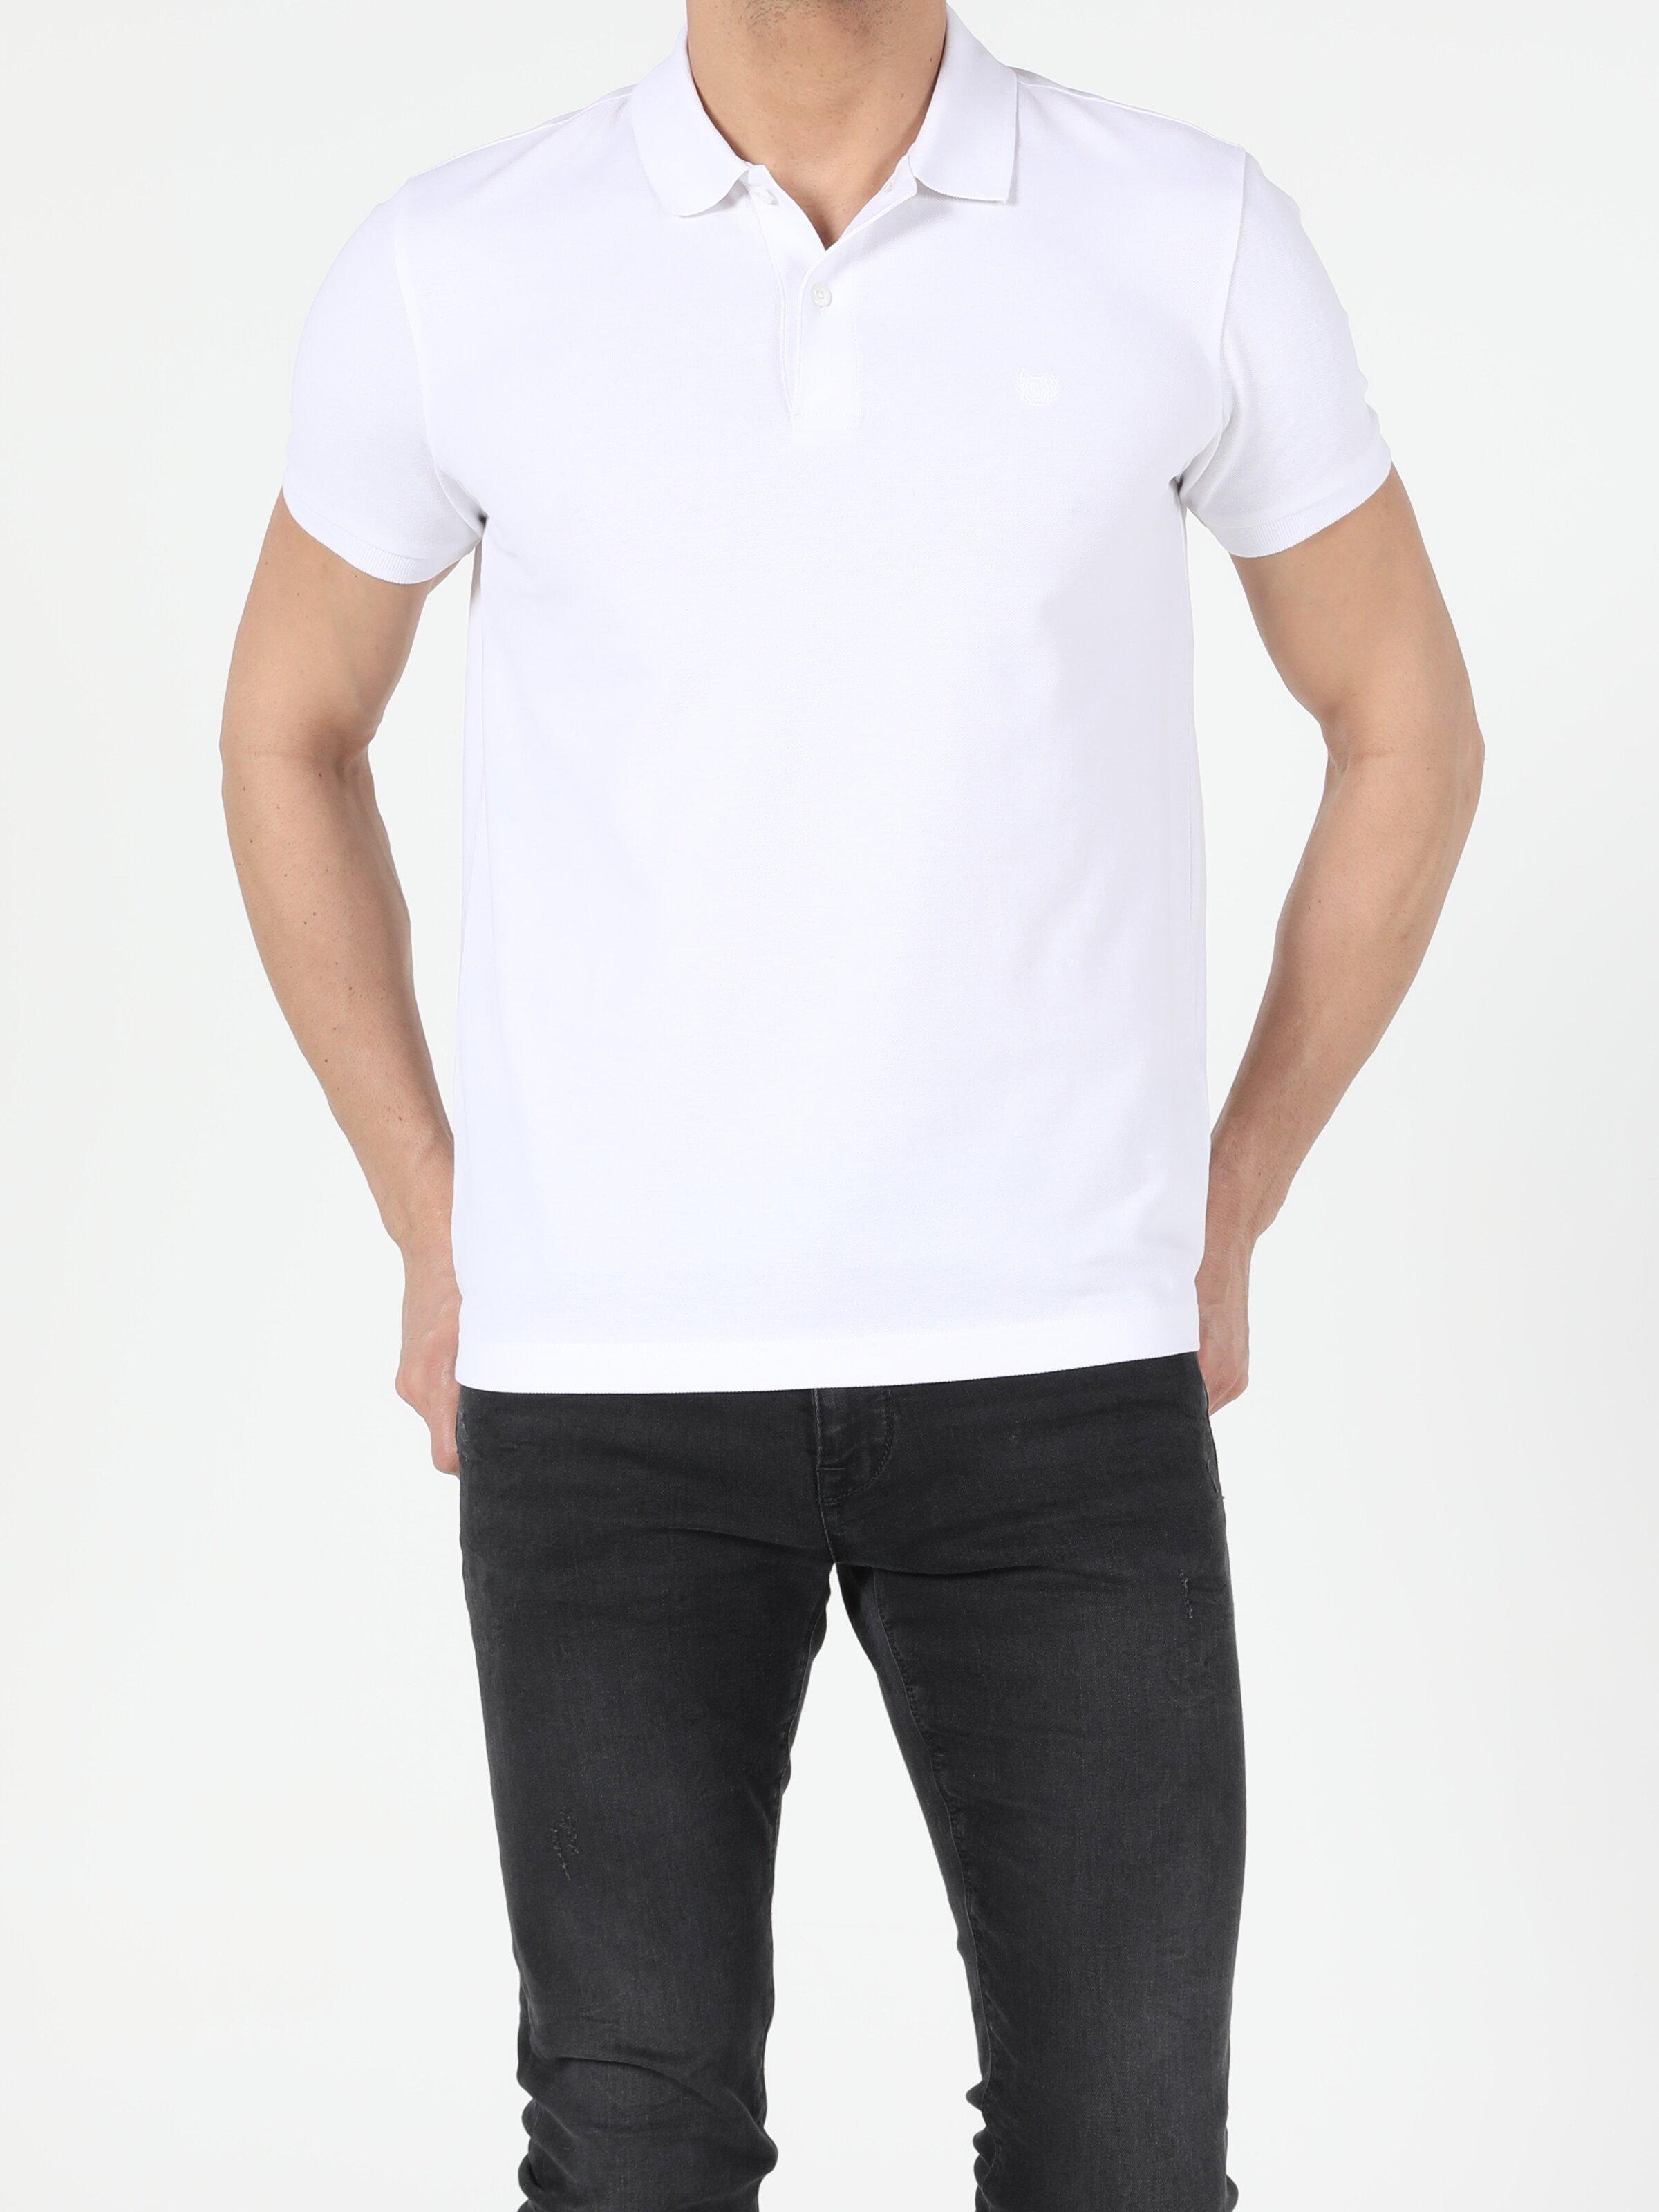 Regular Fit Polo Yaka Erkek Beyaz Polo Kısa Kol